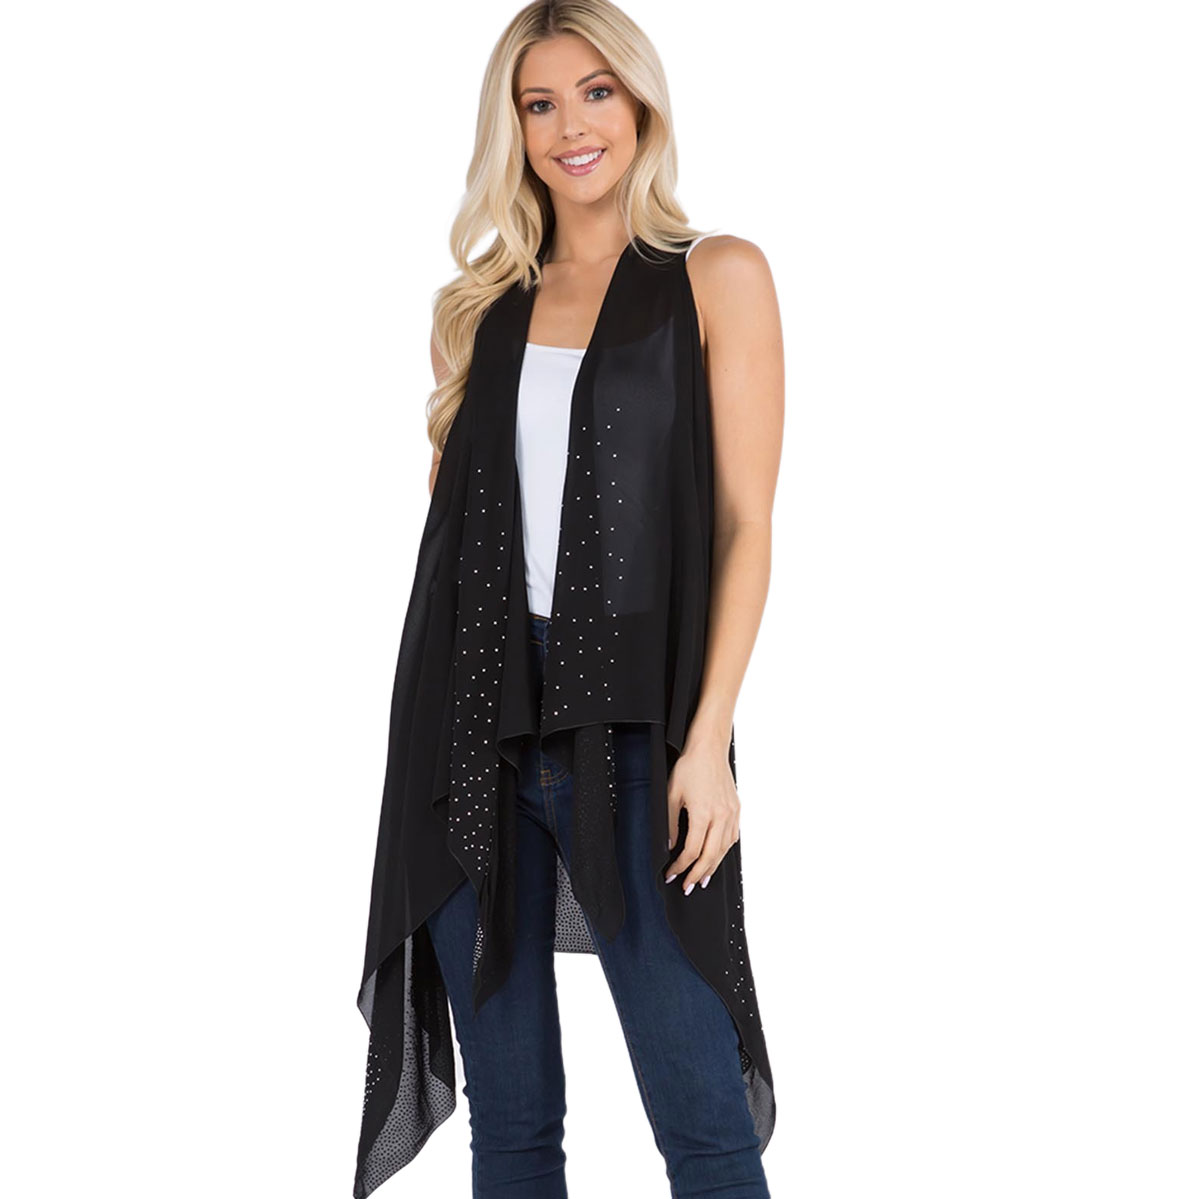 Vest - Sheer Crepe  w/ Crystals 403